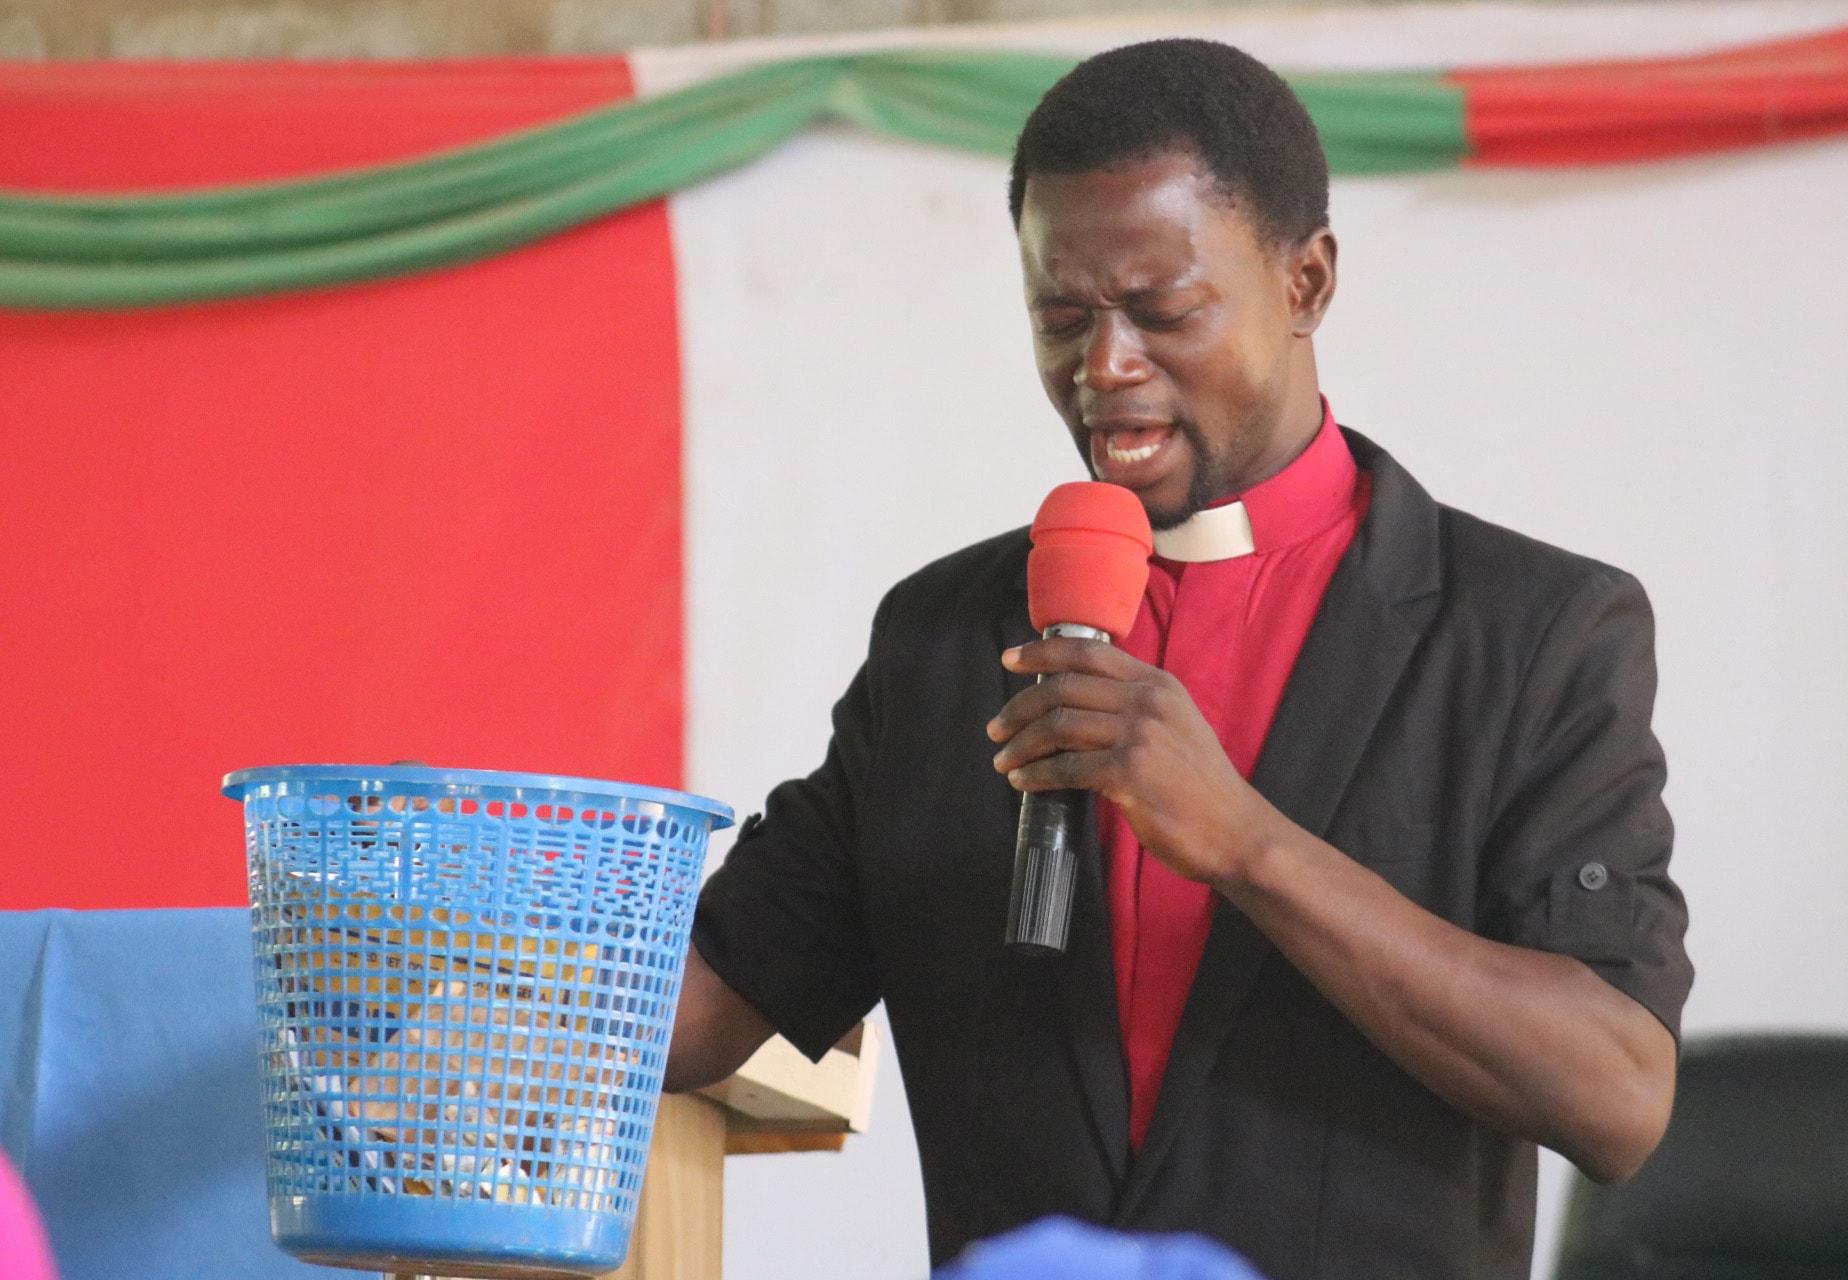 The Rev. Karabi Moodi, associate pastor at Abuja Area 1 United Methodist Church, prays over the Sunday offering on June 2, 2019.   Photo by E Julu Swen, UM News.